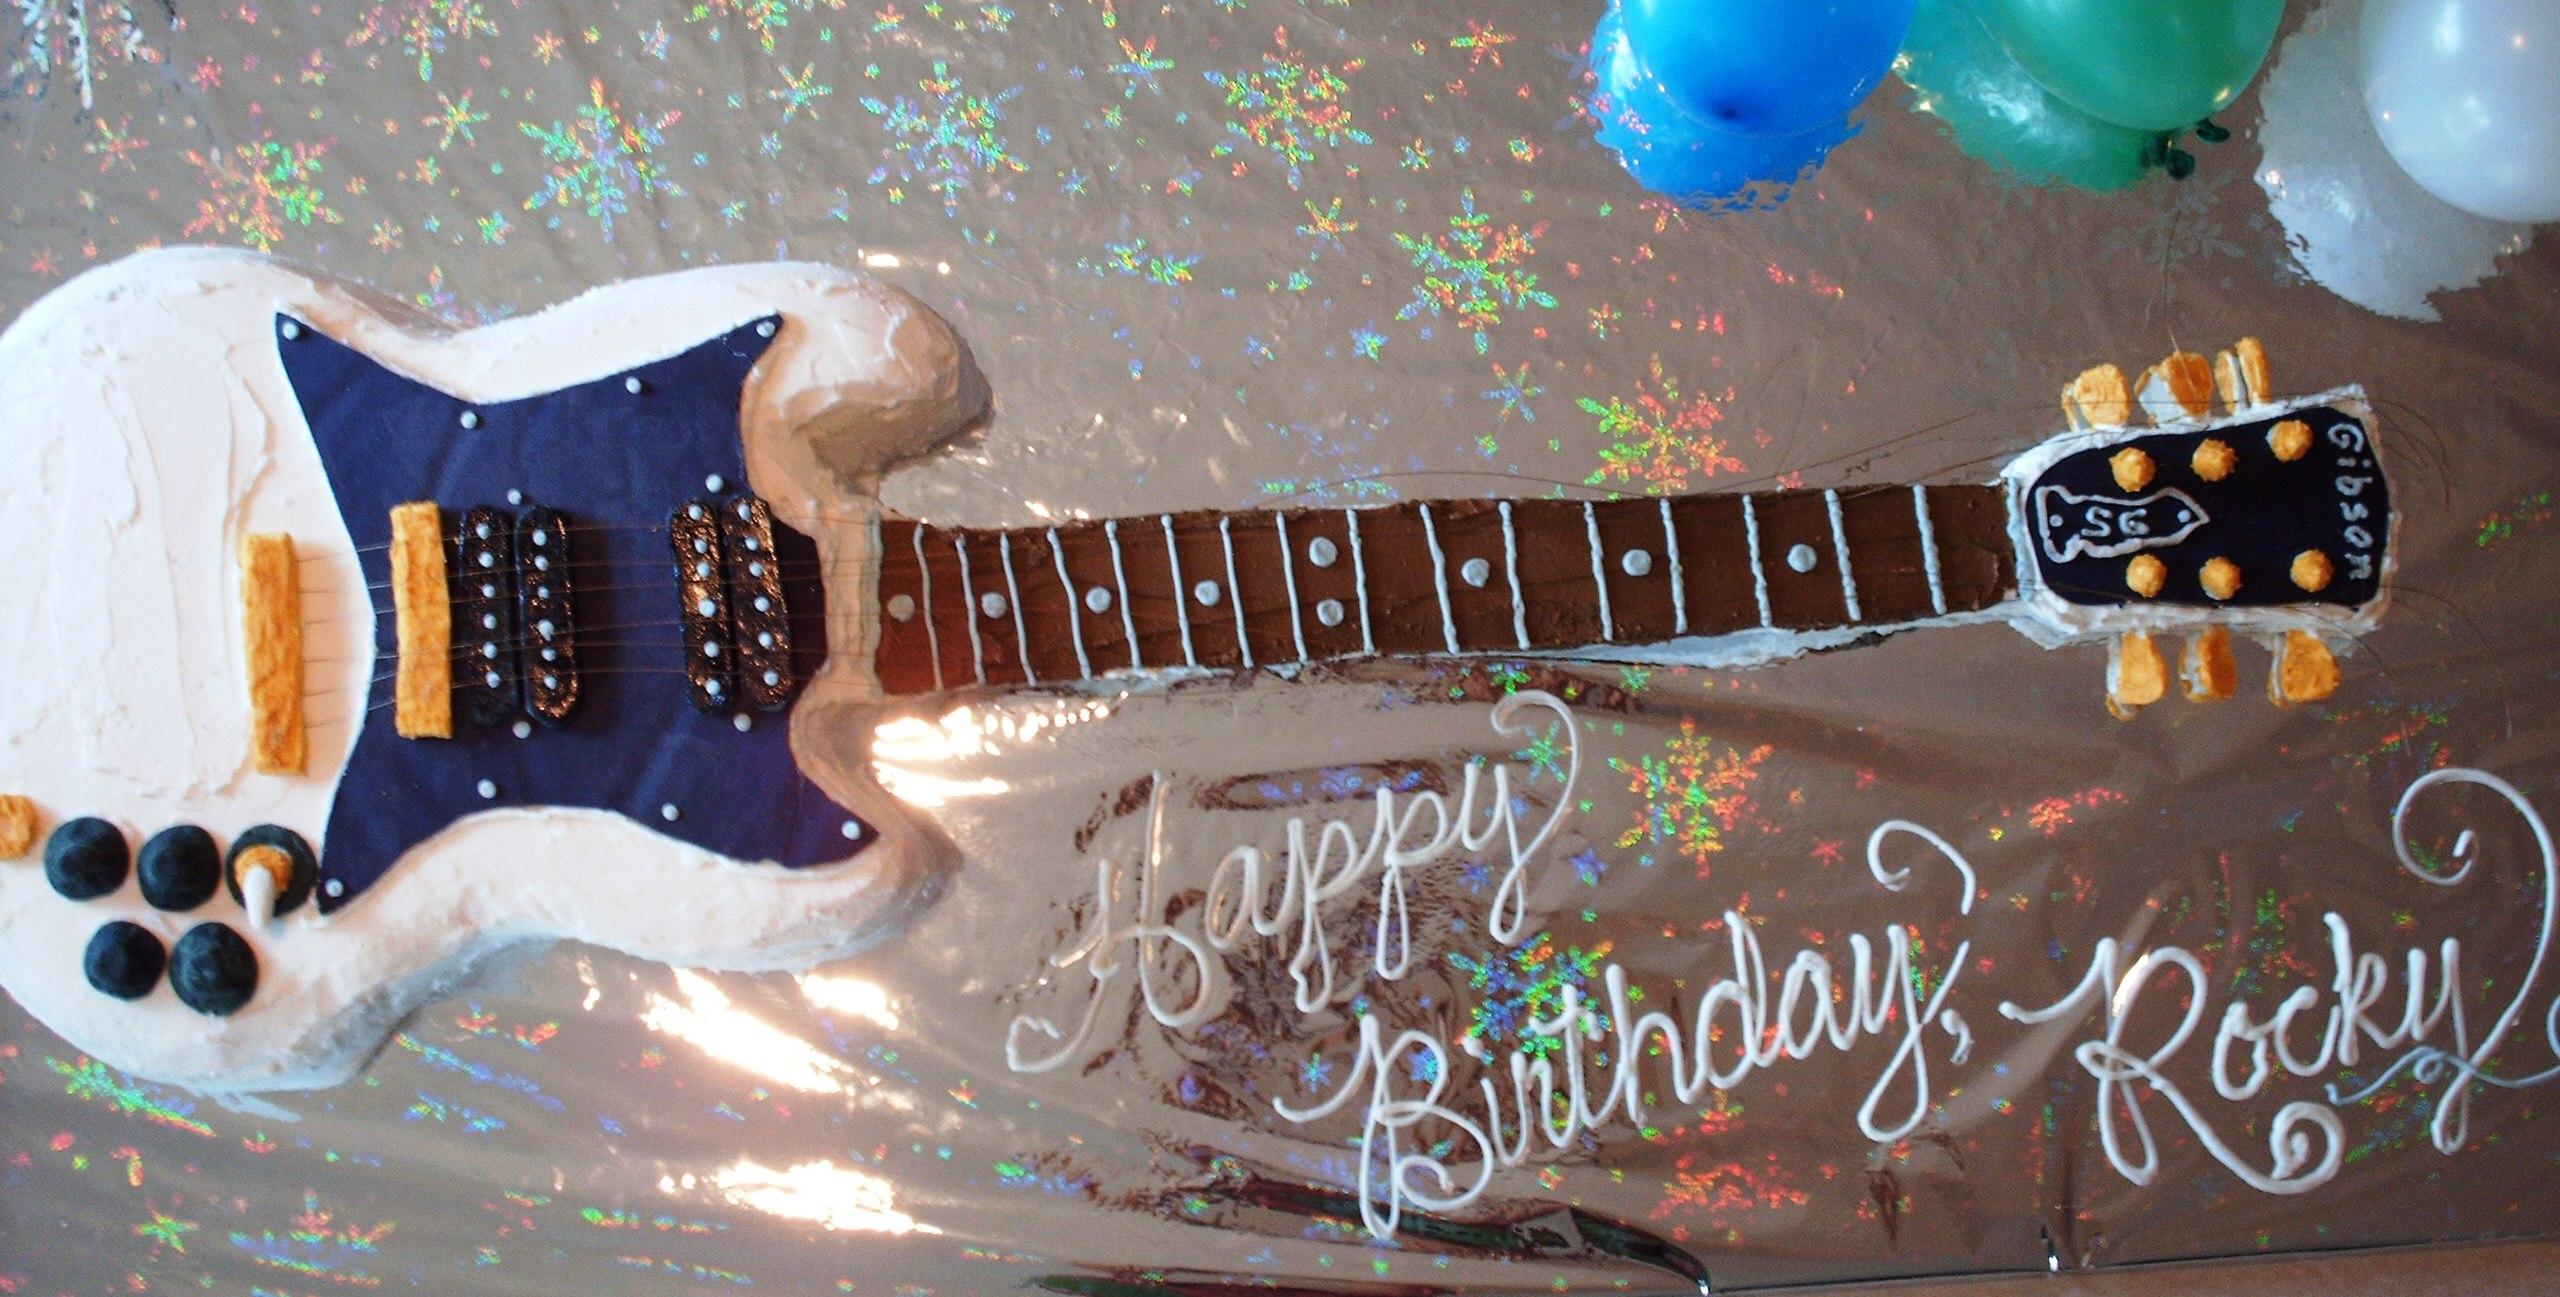 guitar-cake-6.jpg